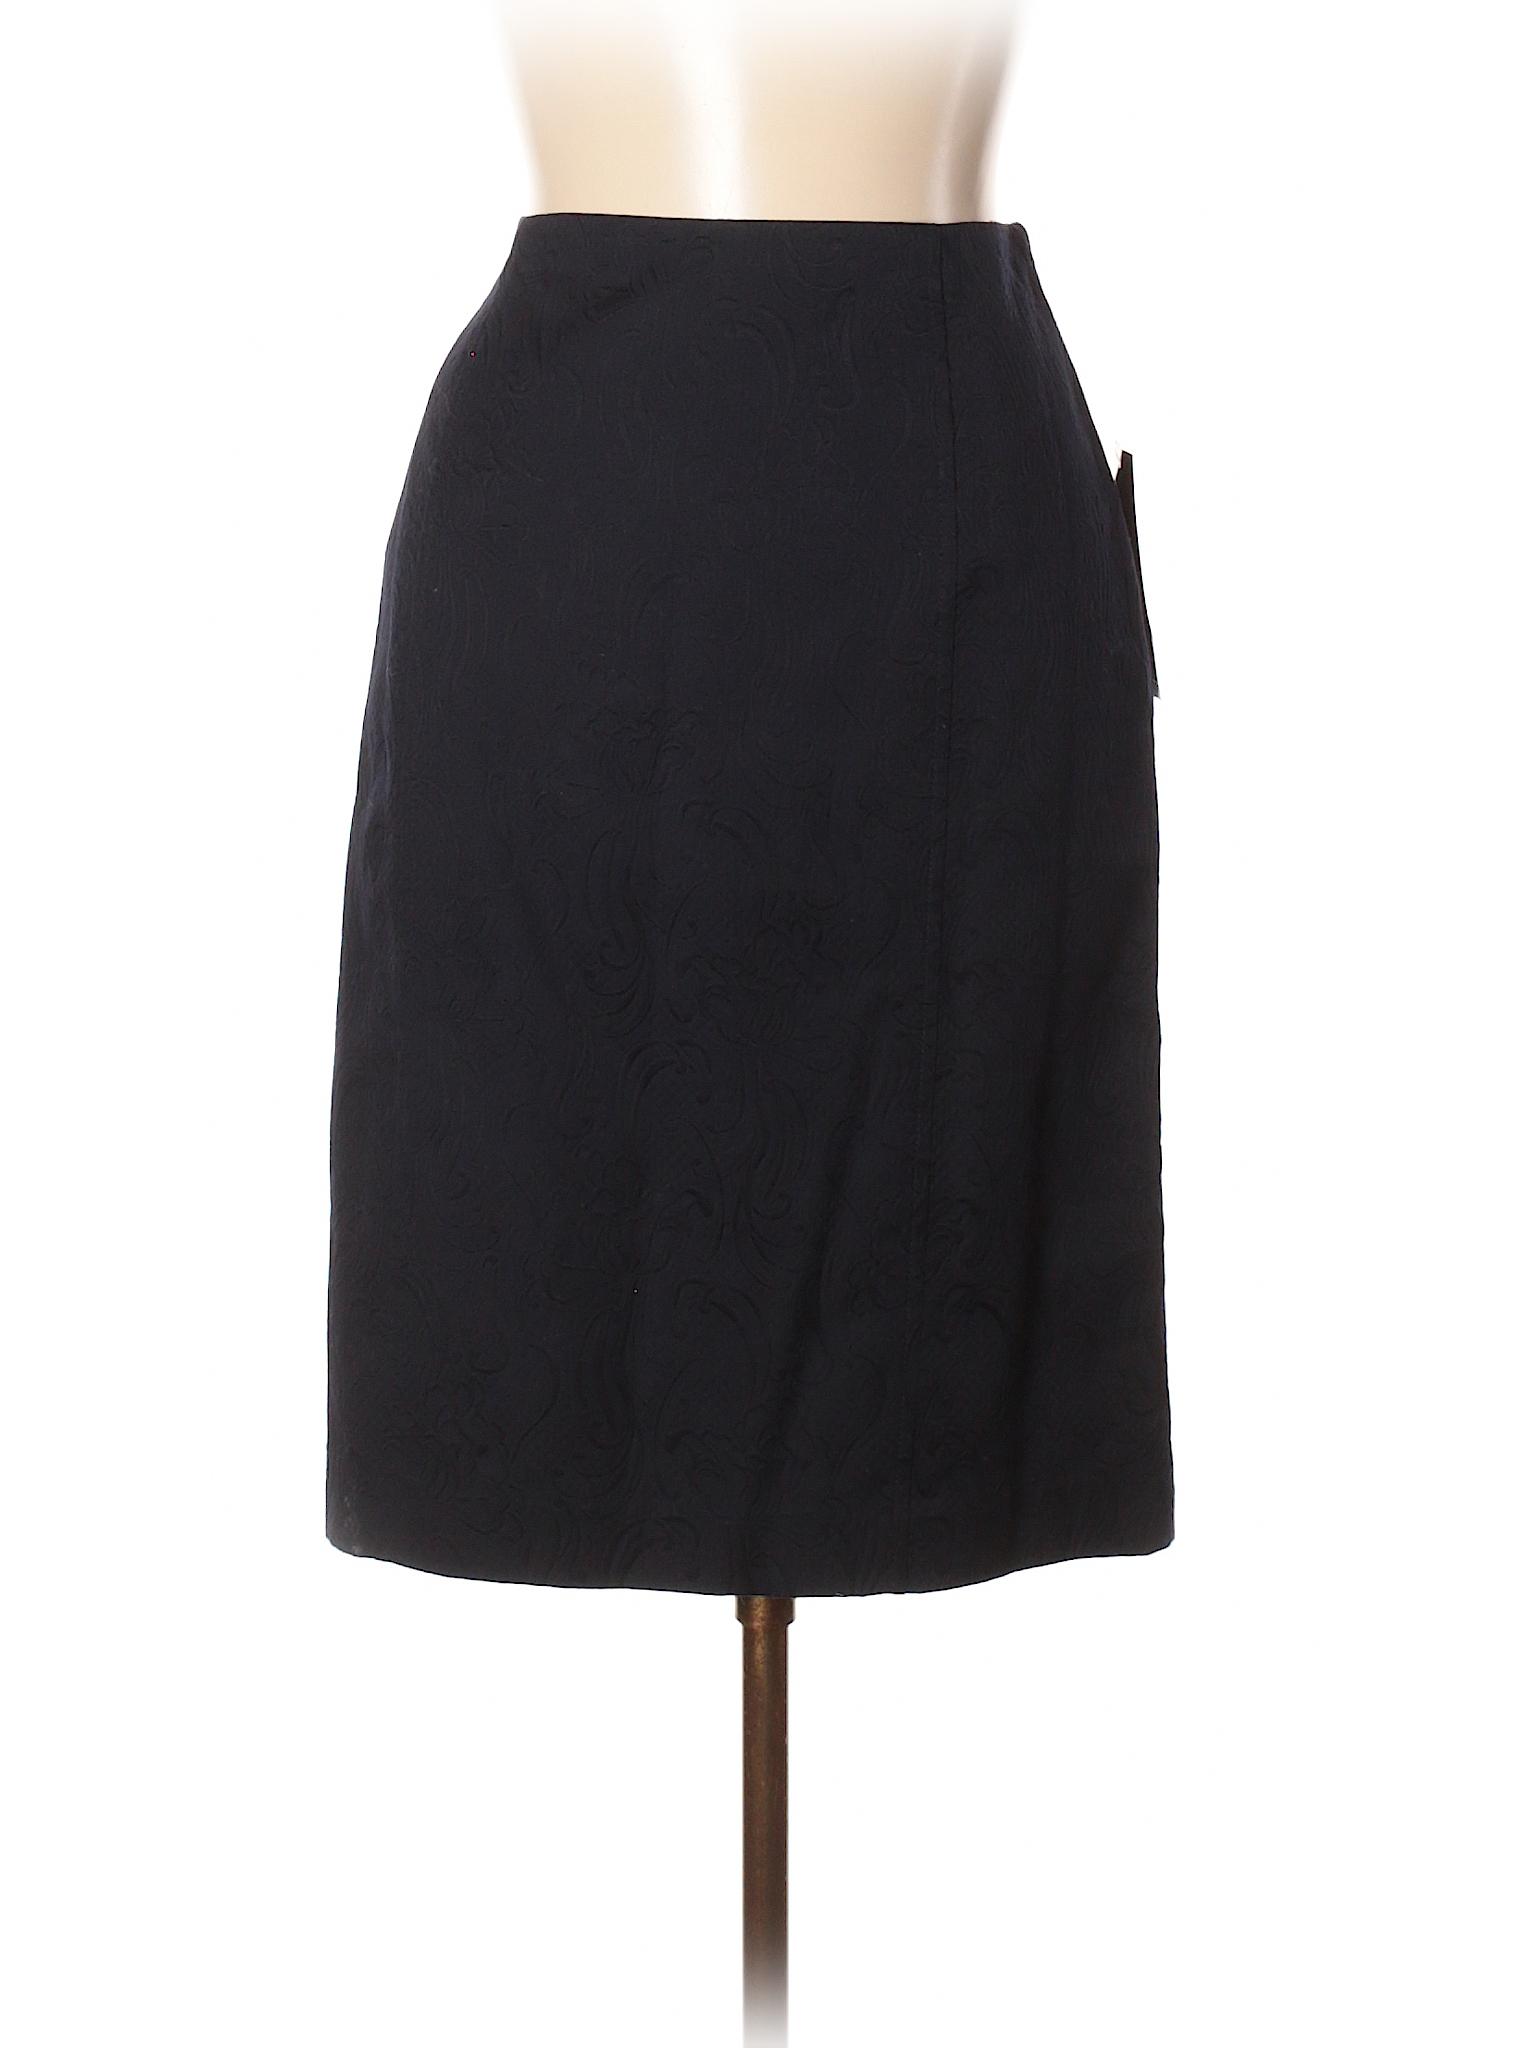 Skirt Boutique Formal Formal Boutique Boutique Skirt Skirt Skirt Formal Boutique Formal qwa8OxE